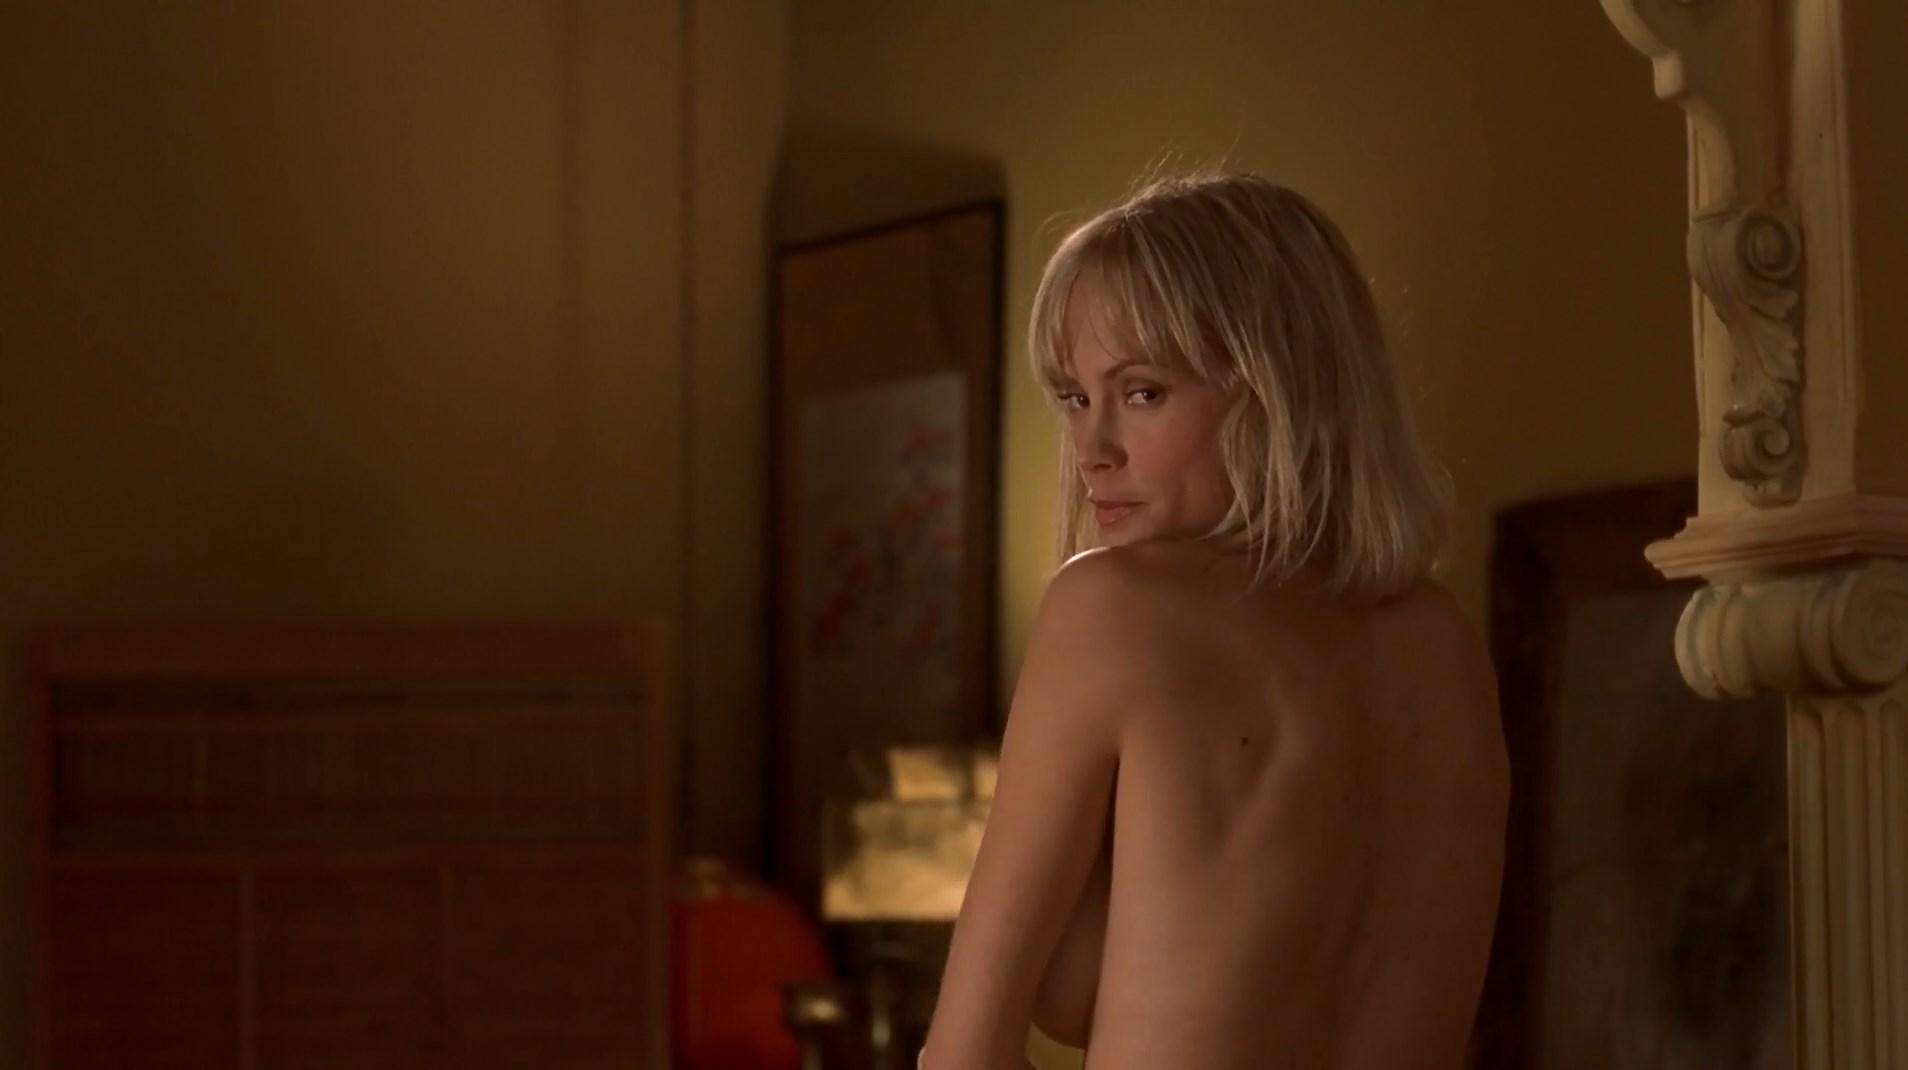 Morrison nude jennifer Jennifer Morrison